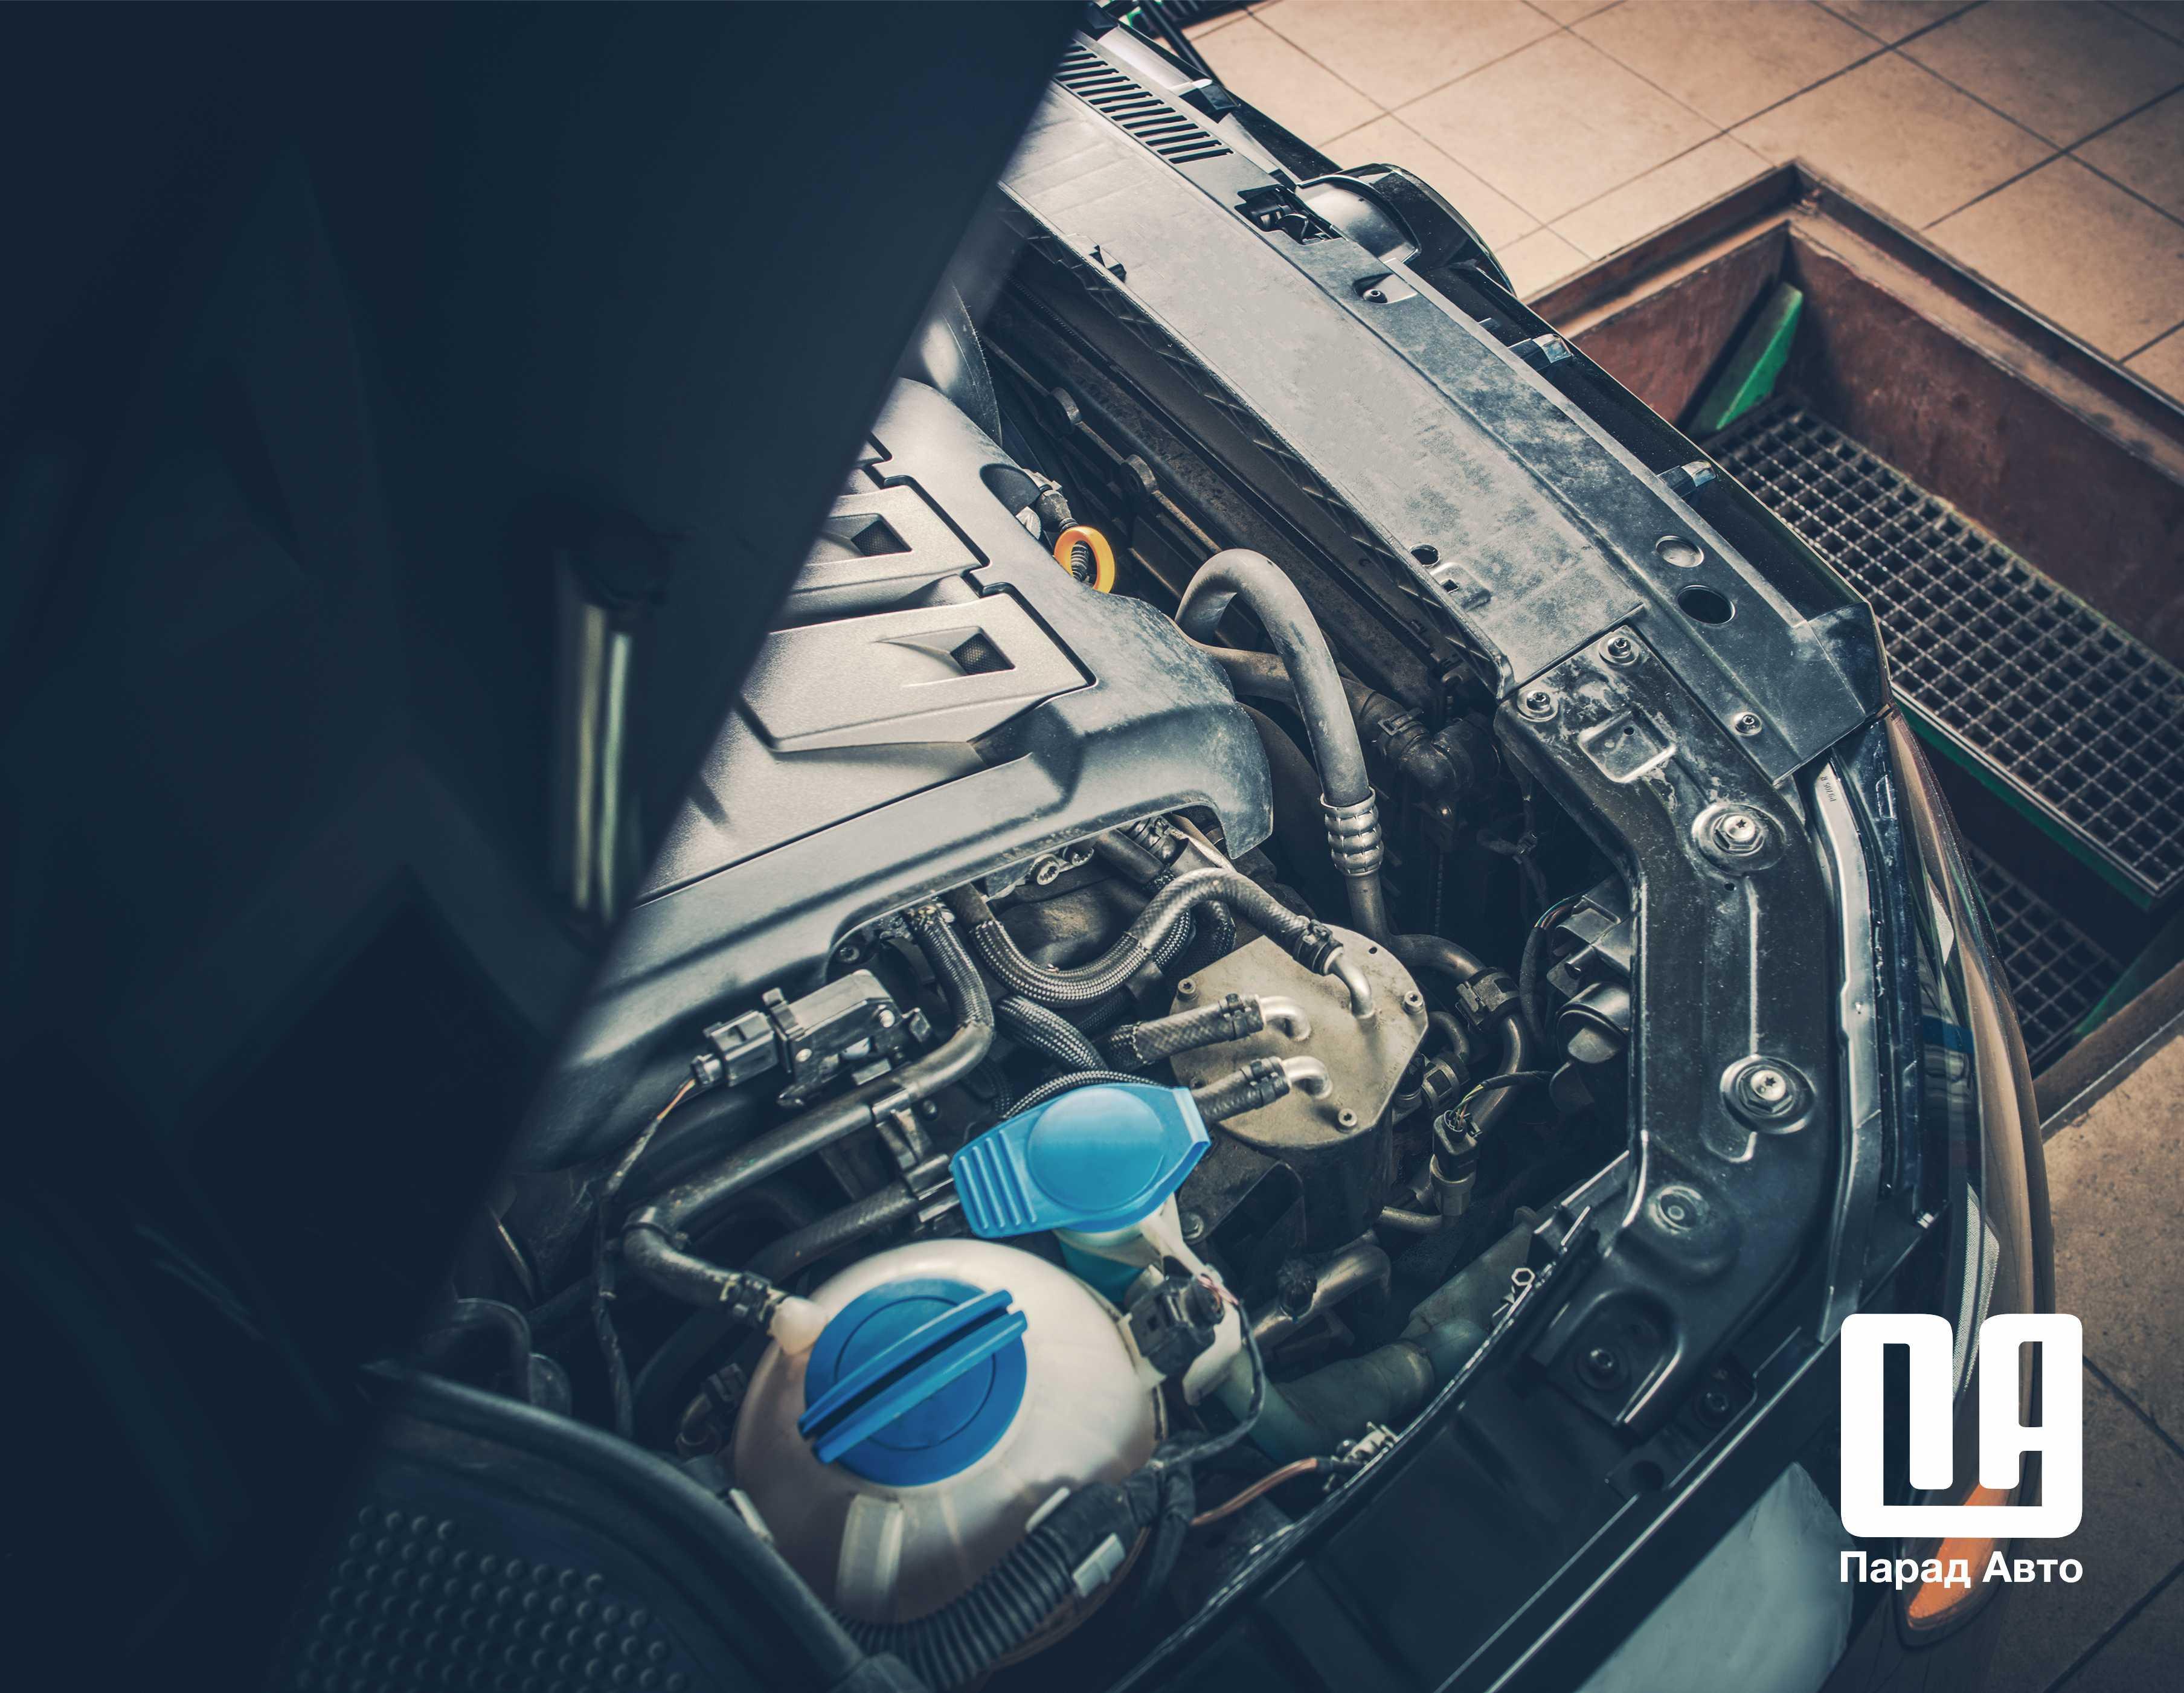 Диагностика двигателя в Минске